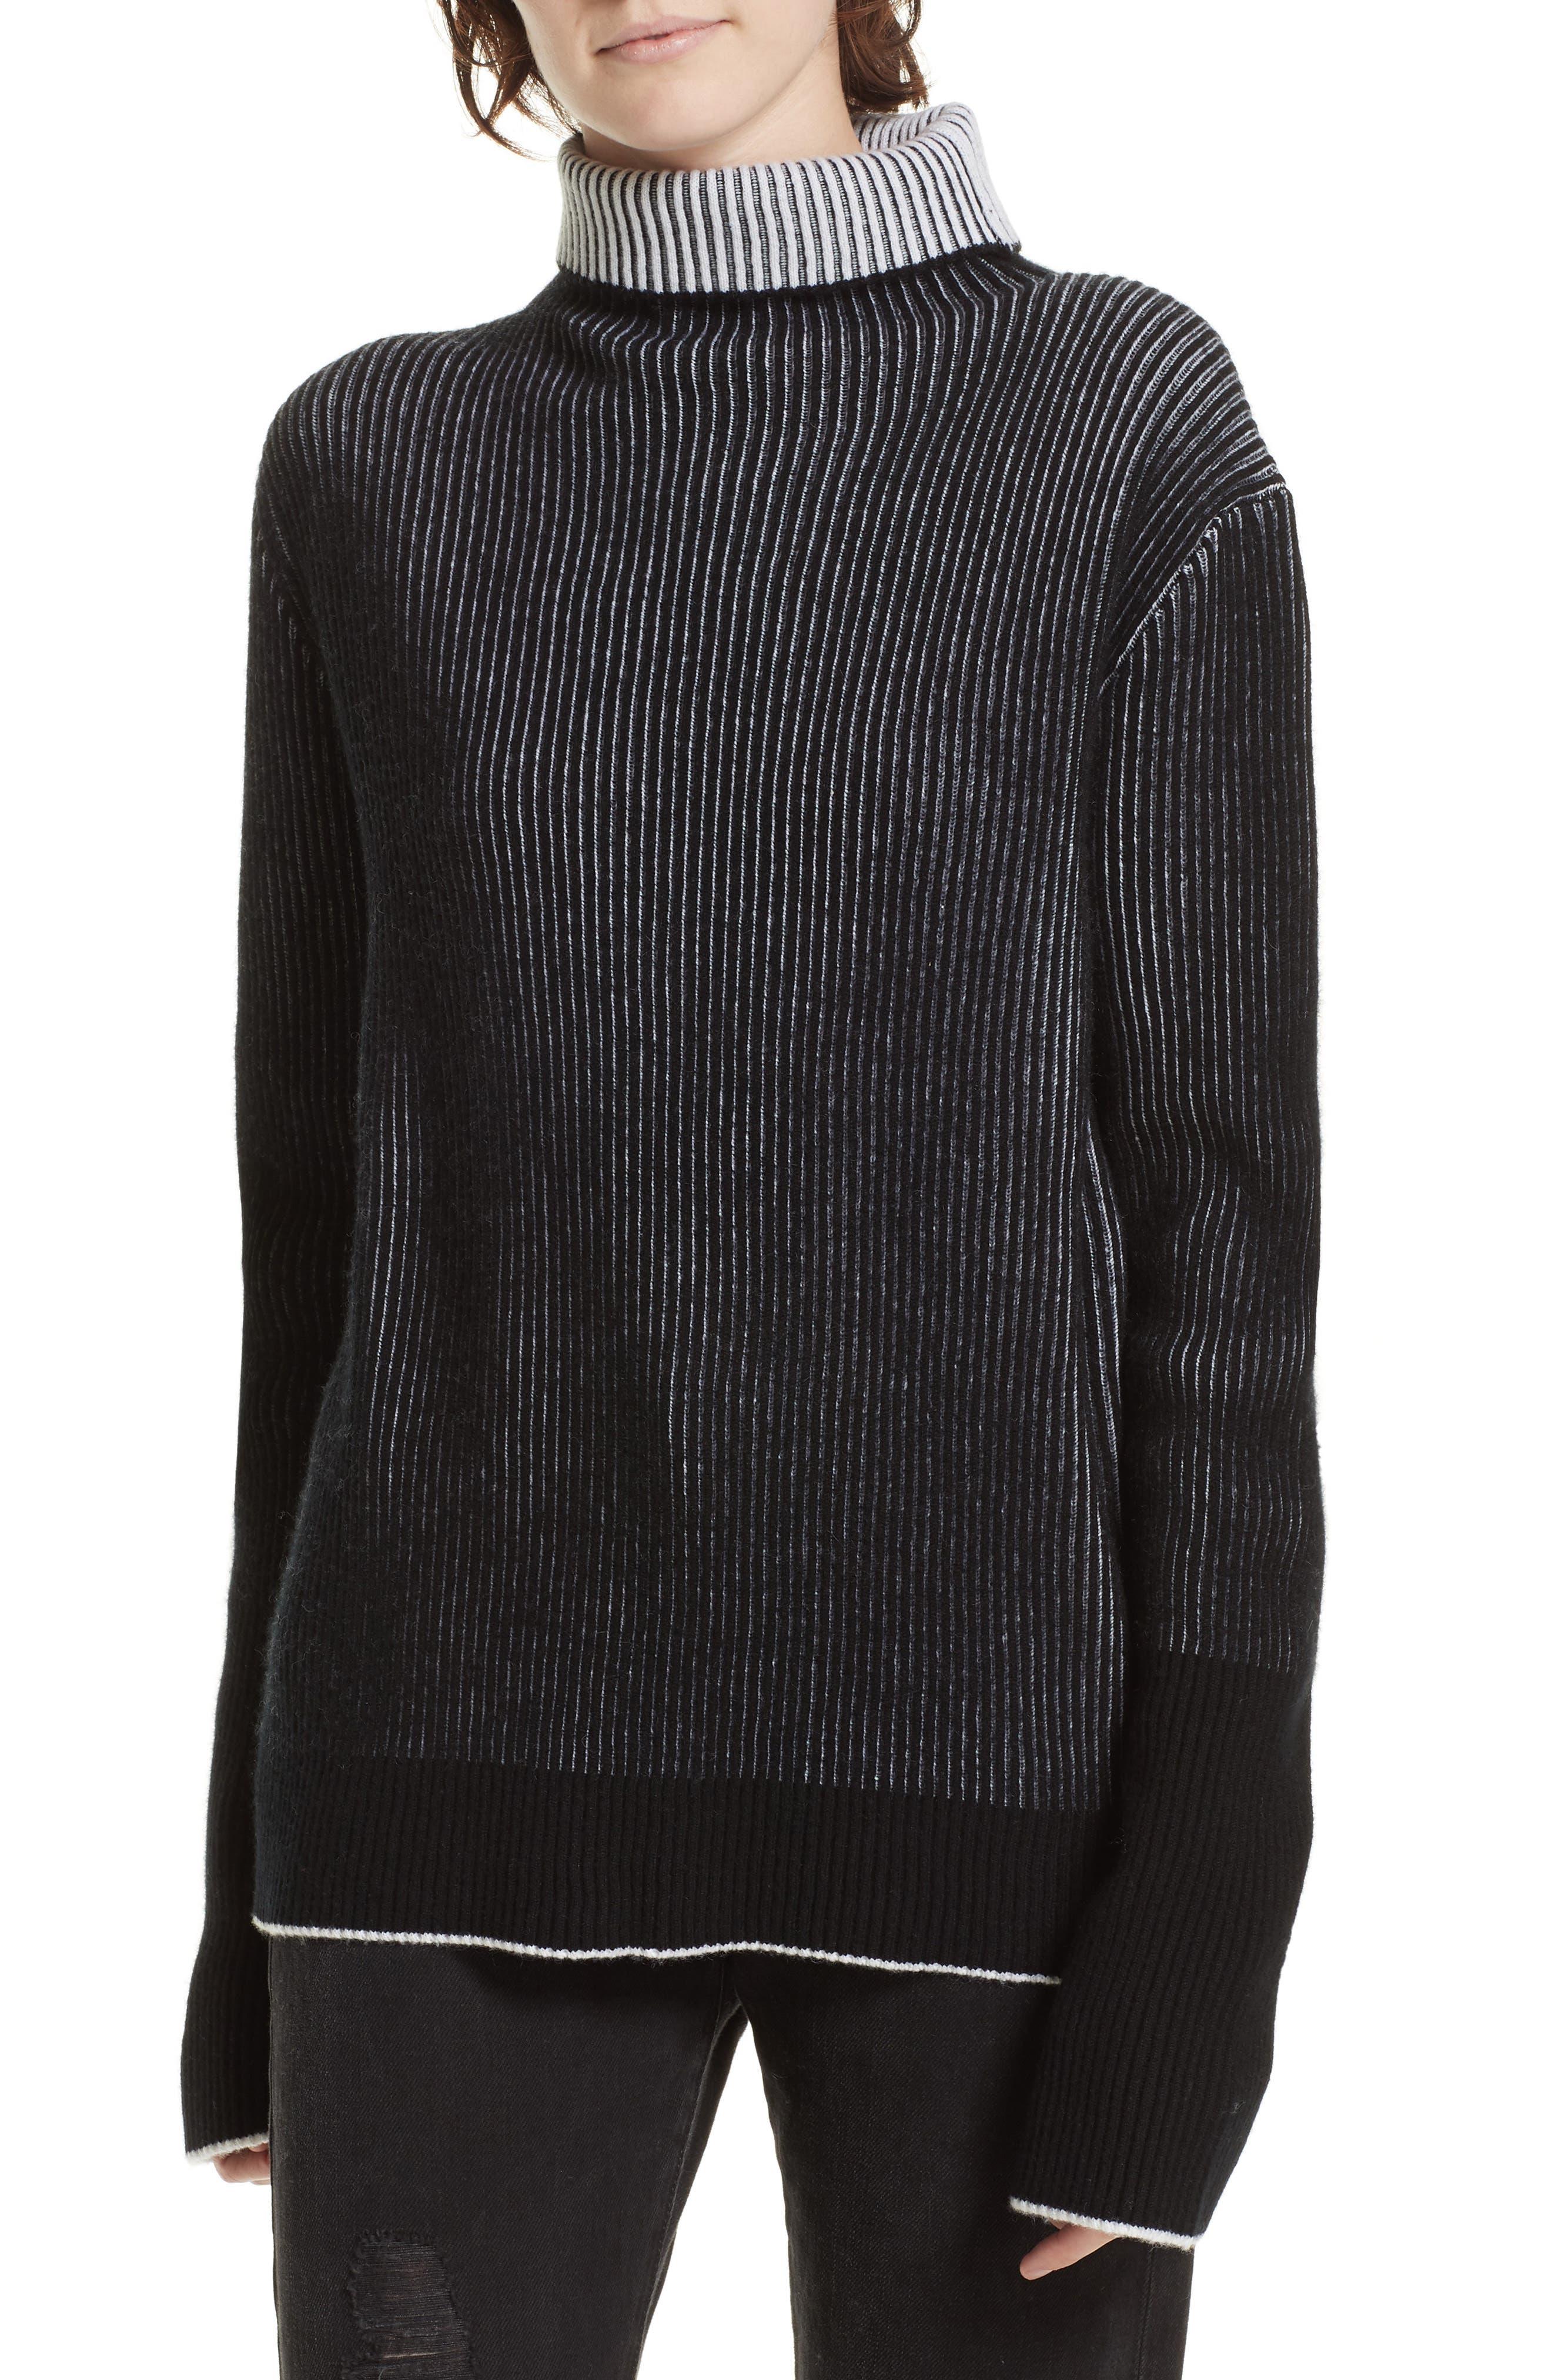 LA LIGNE Aaa Turtleneck Cashmere Sweater in Black/ Cream